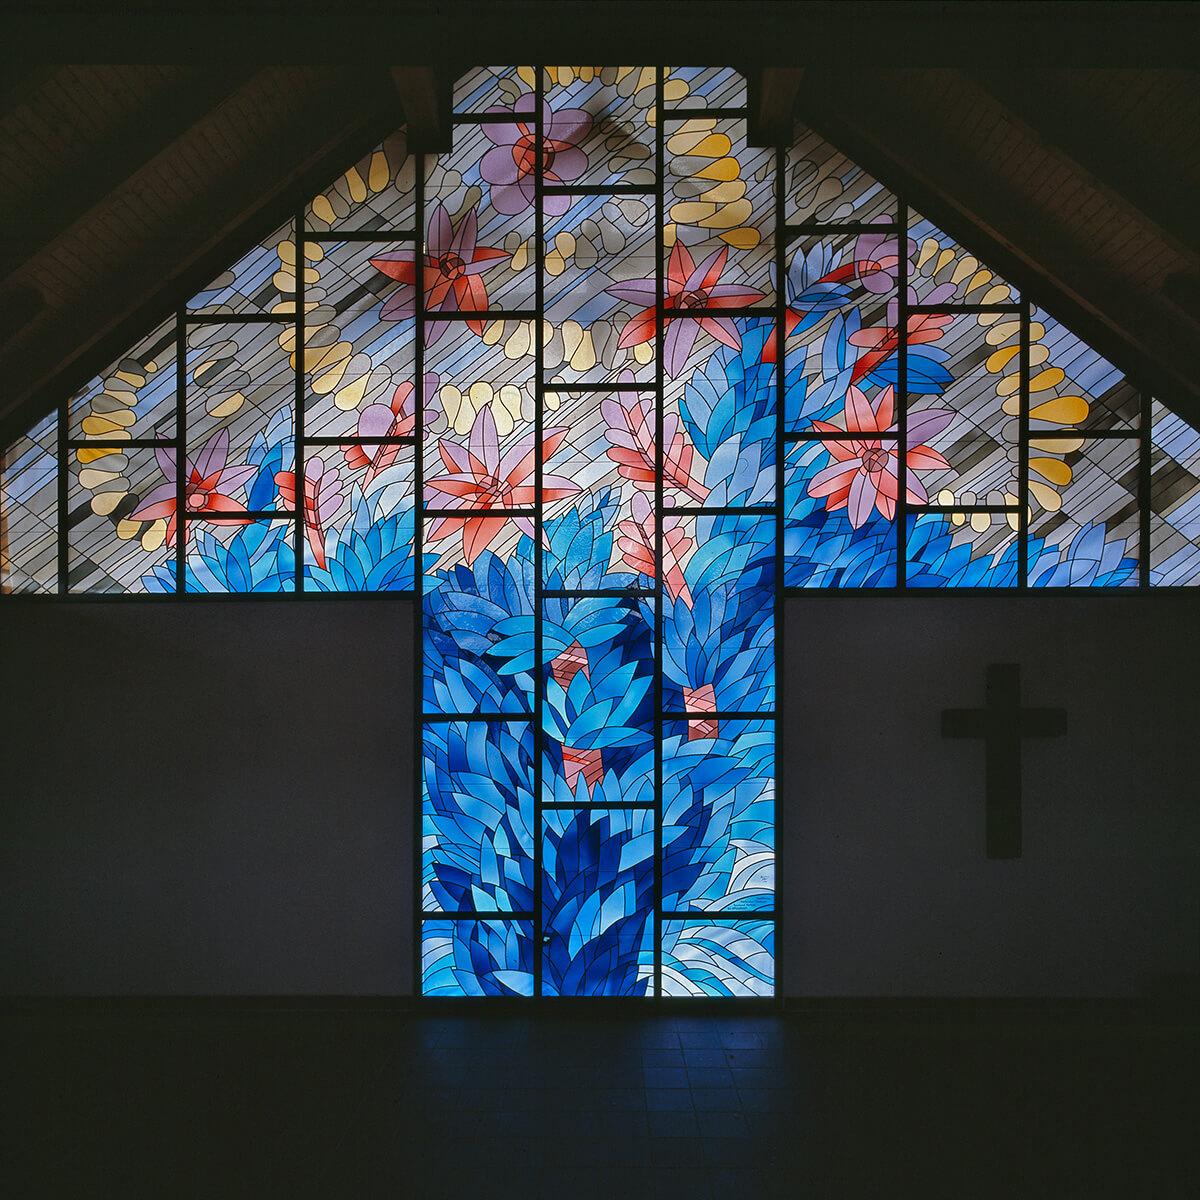 Barbara Jäger Malerei Skulptur Karlsruhe Glasfenster